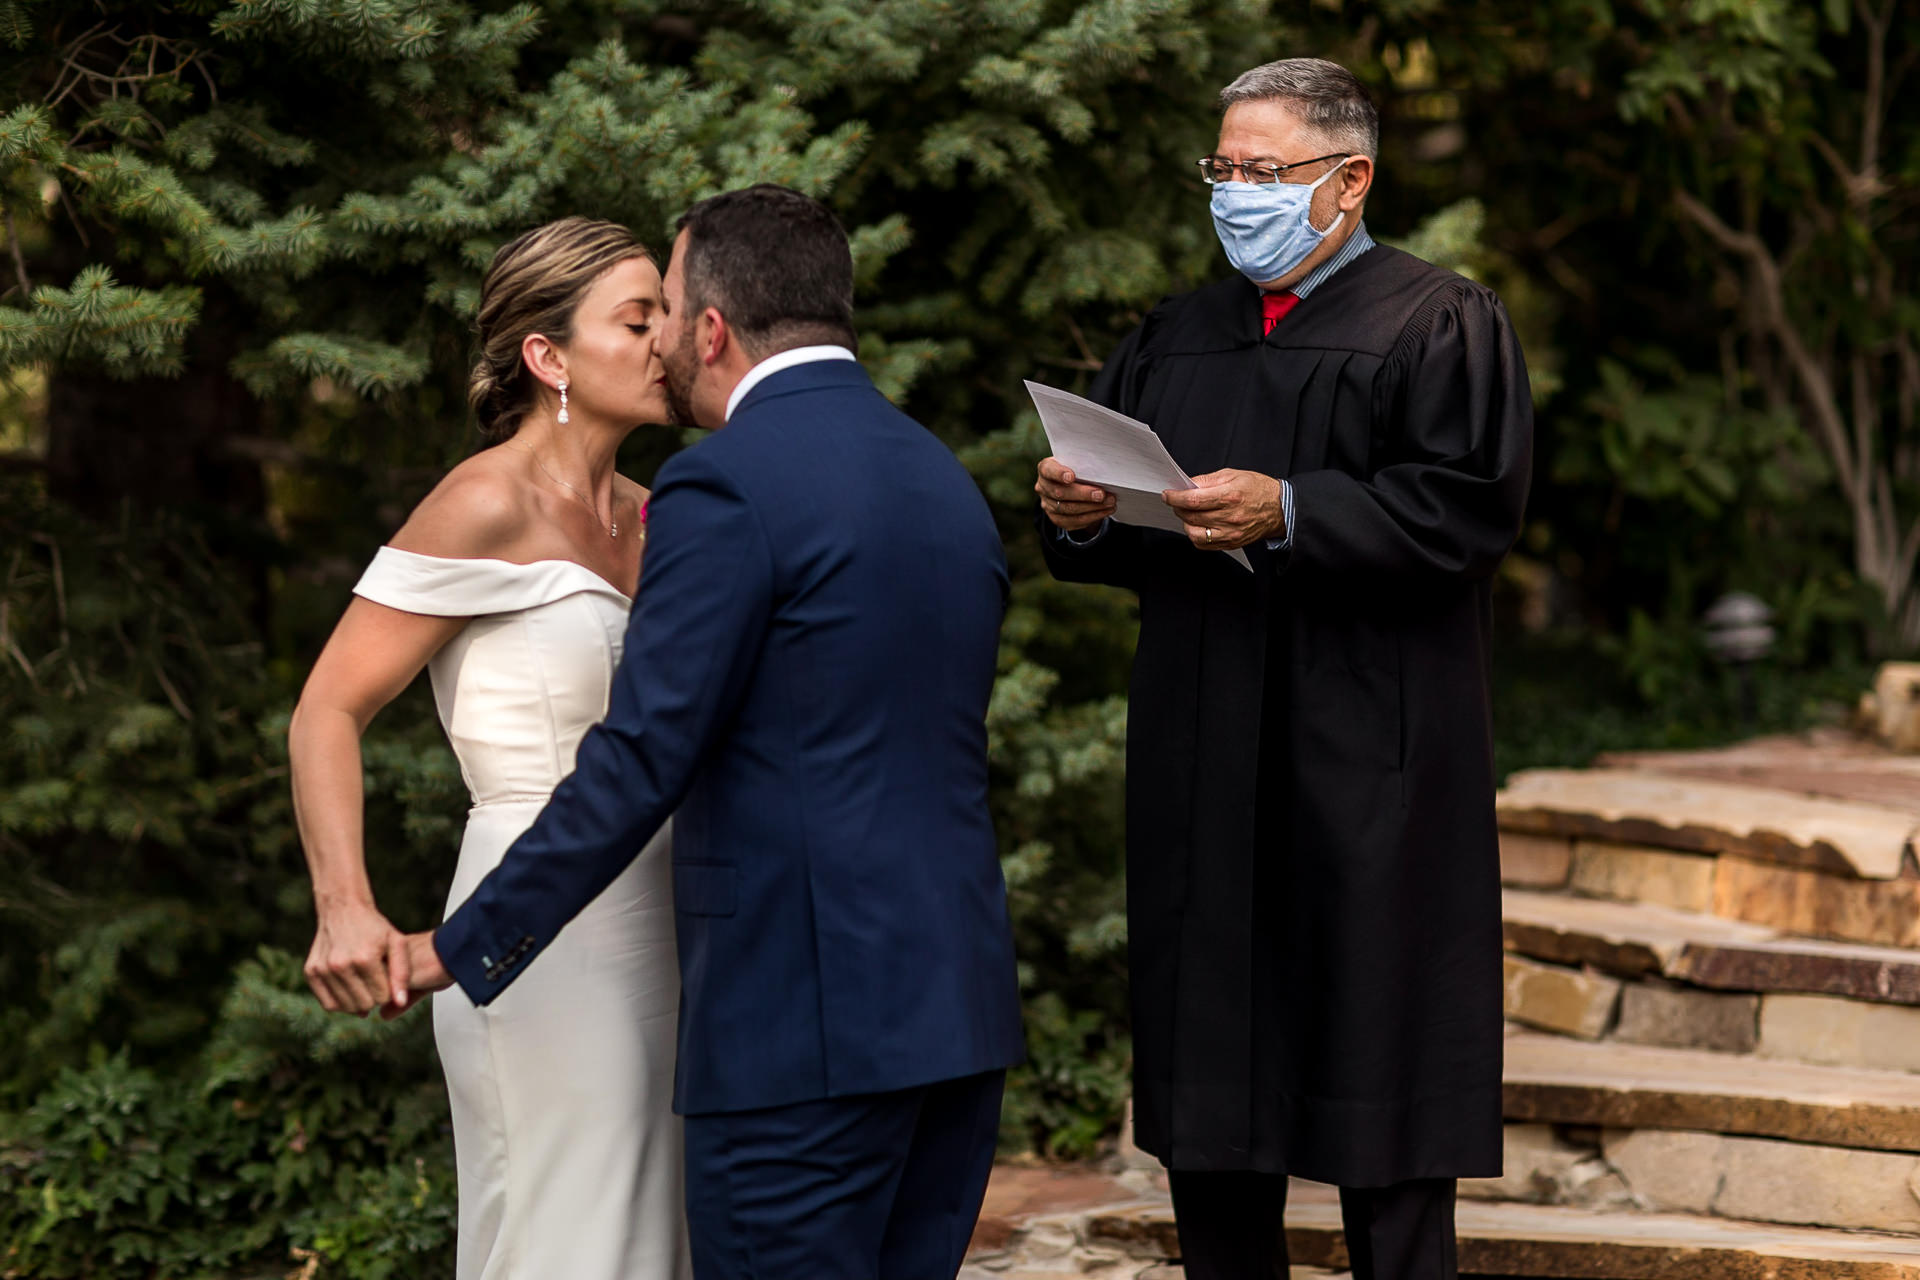 Downtown-Salt-Lake-City-Wedding-633